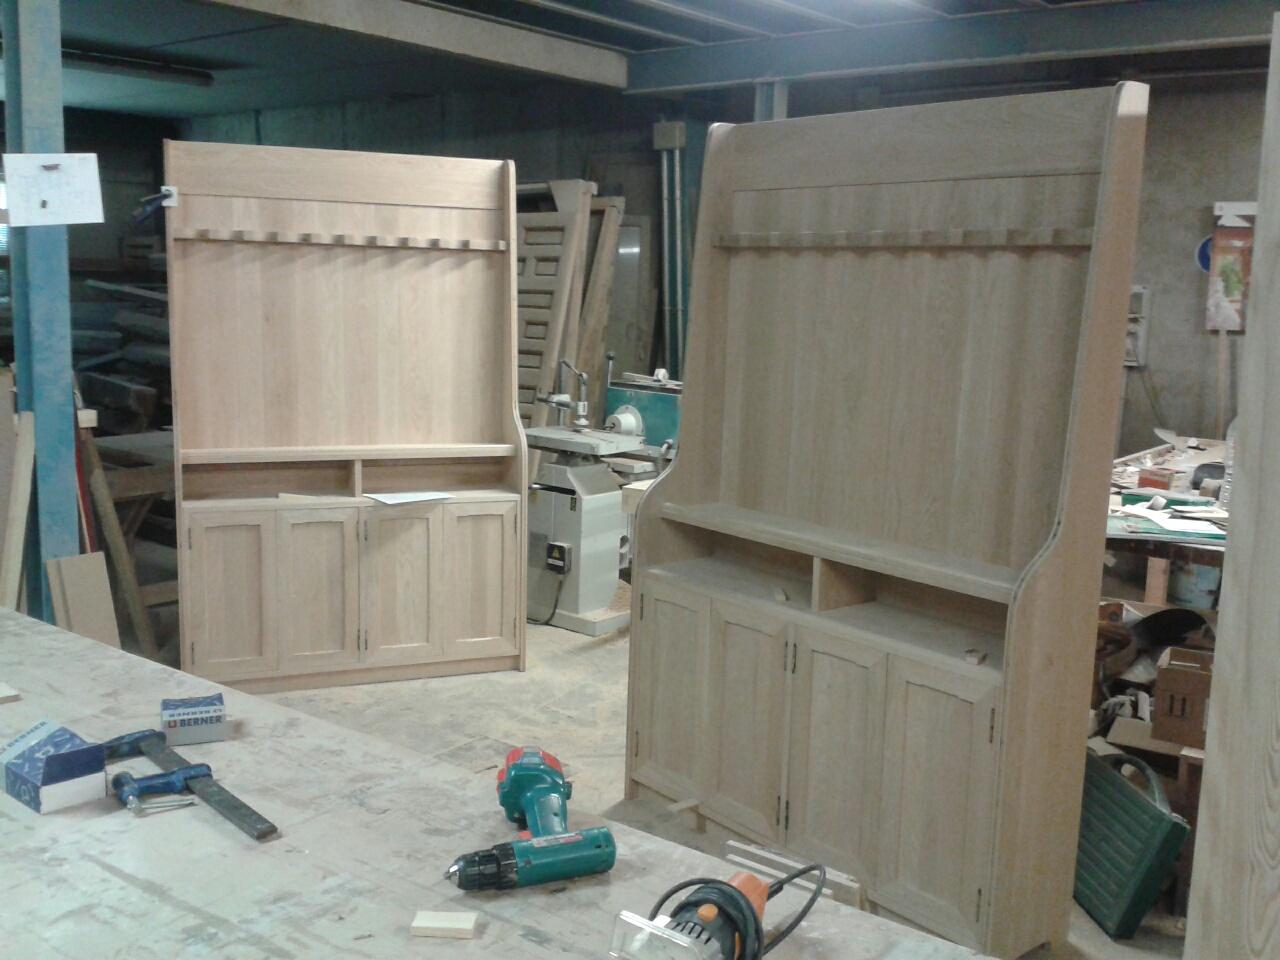 Muebles madera en crudo, descargar o ver fotos